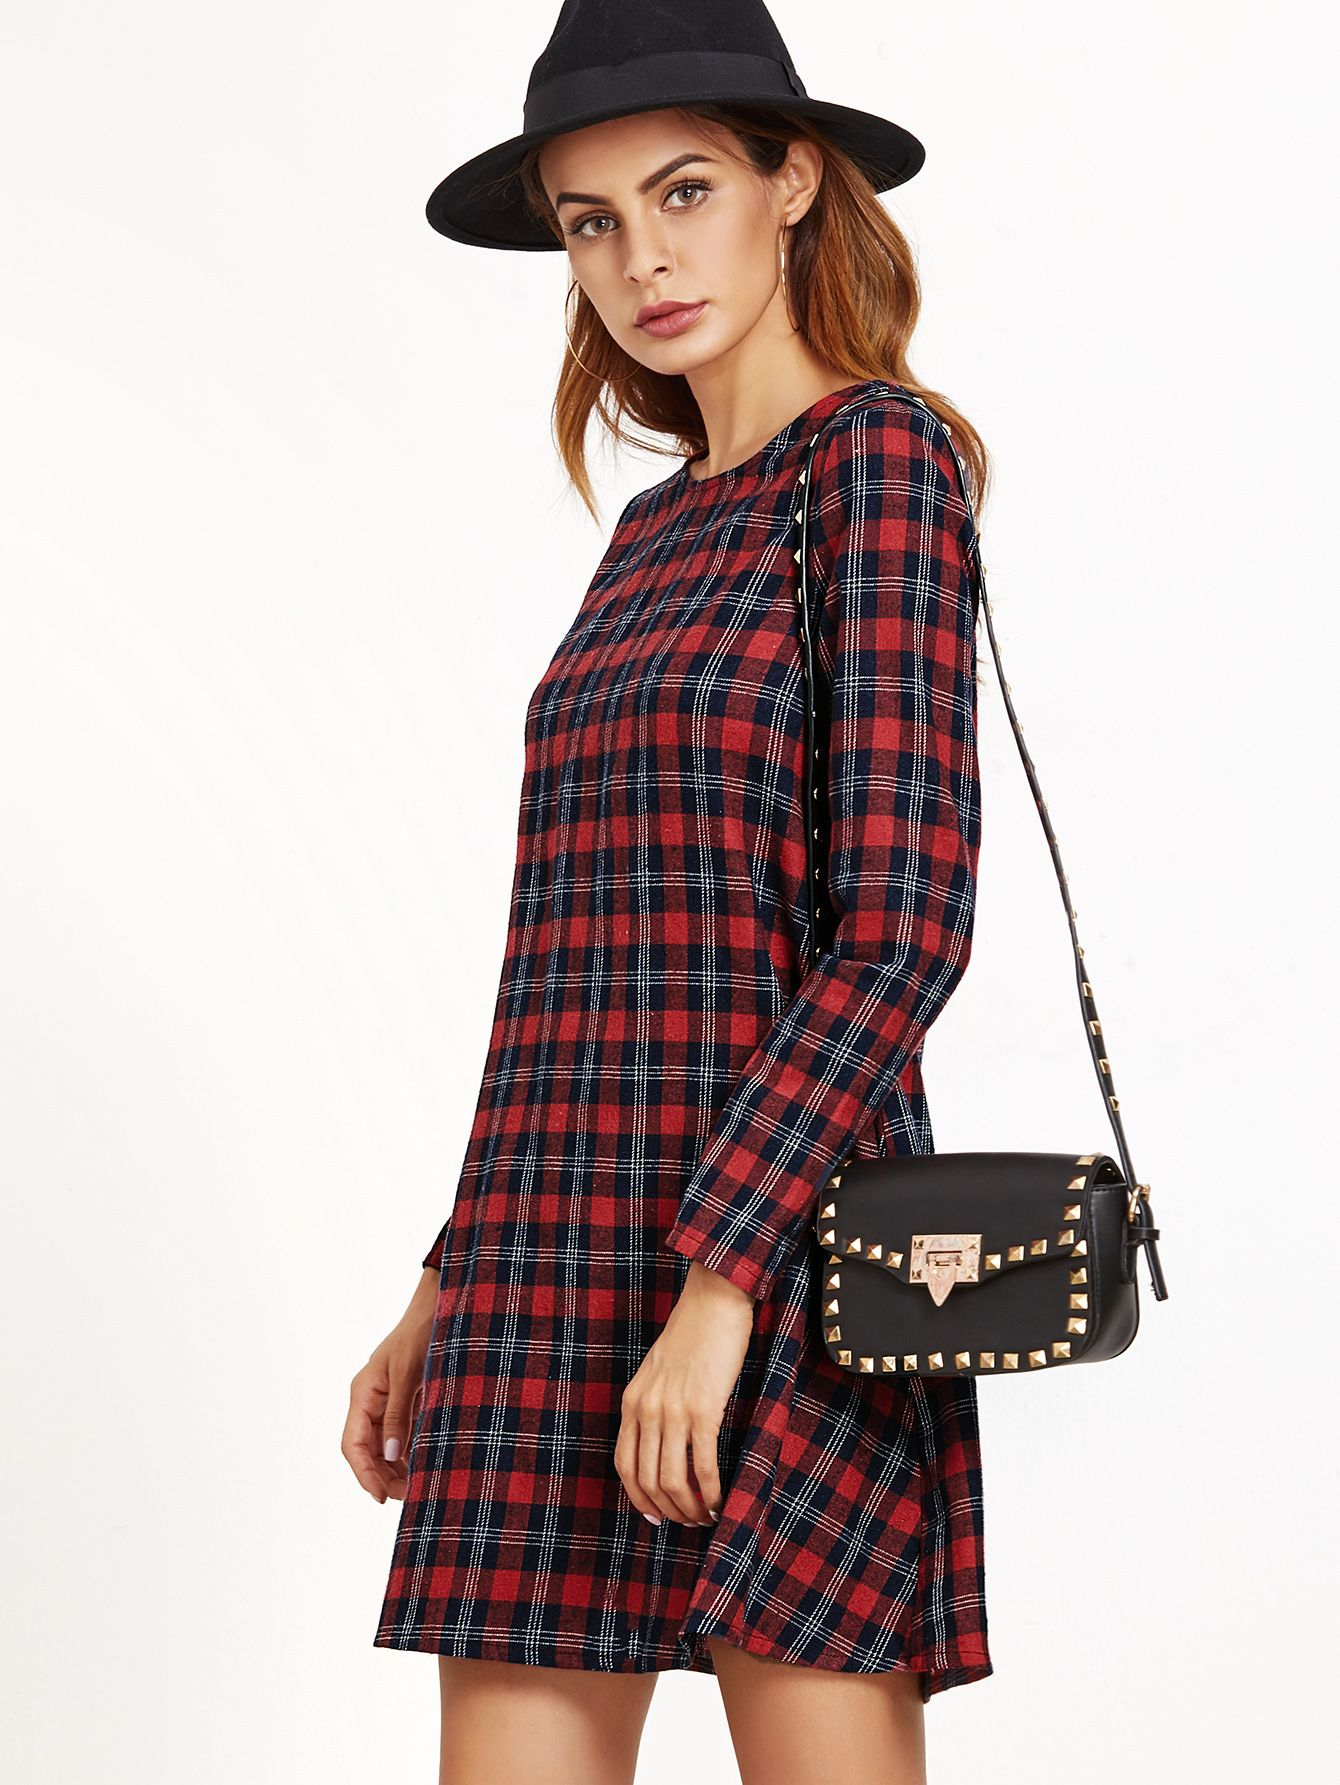 Vestido de cuadros línea A - marino rojo (Shein. 17.25€)  b5a530cfabc8